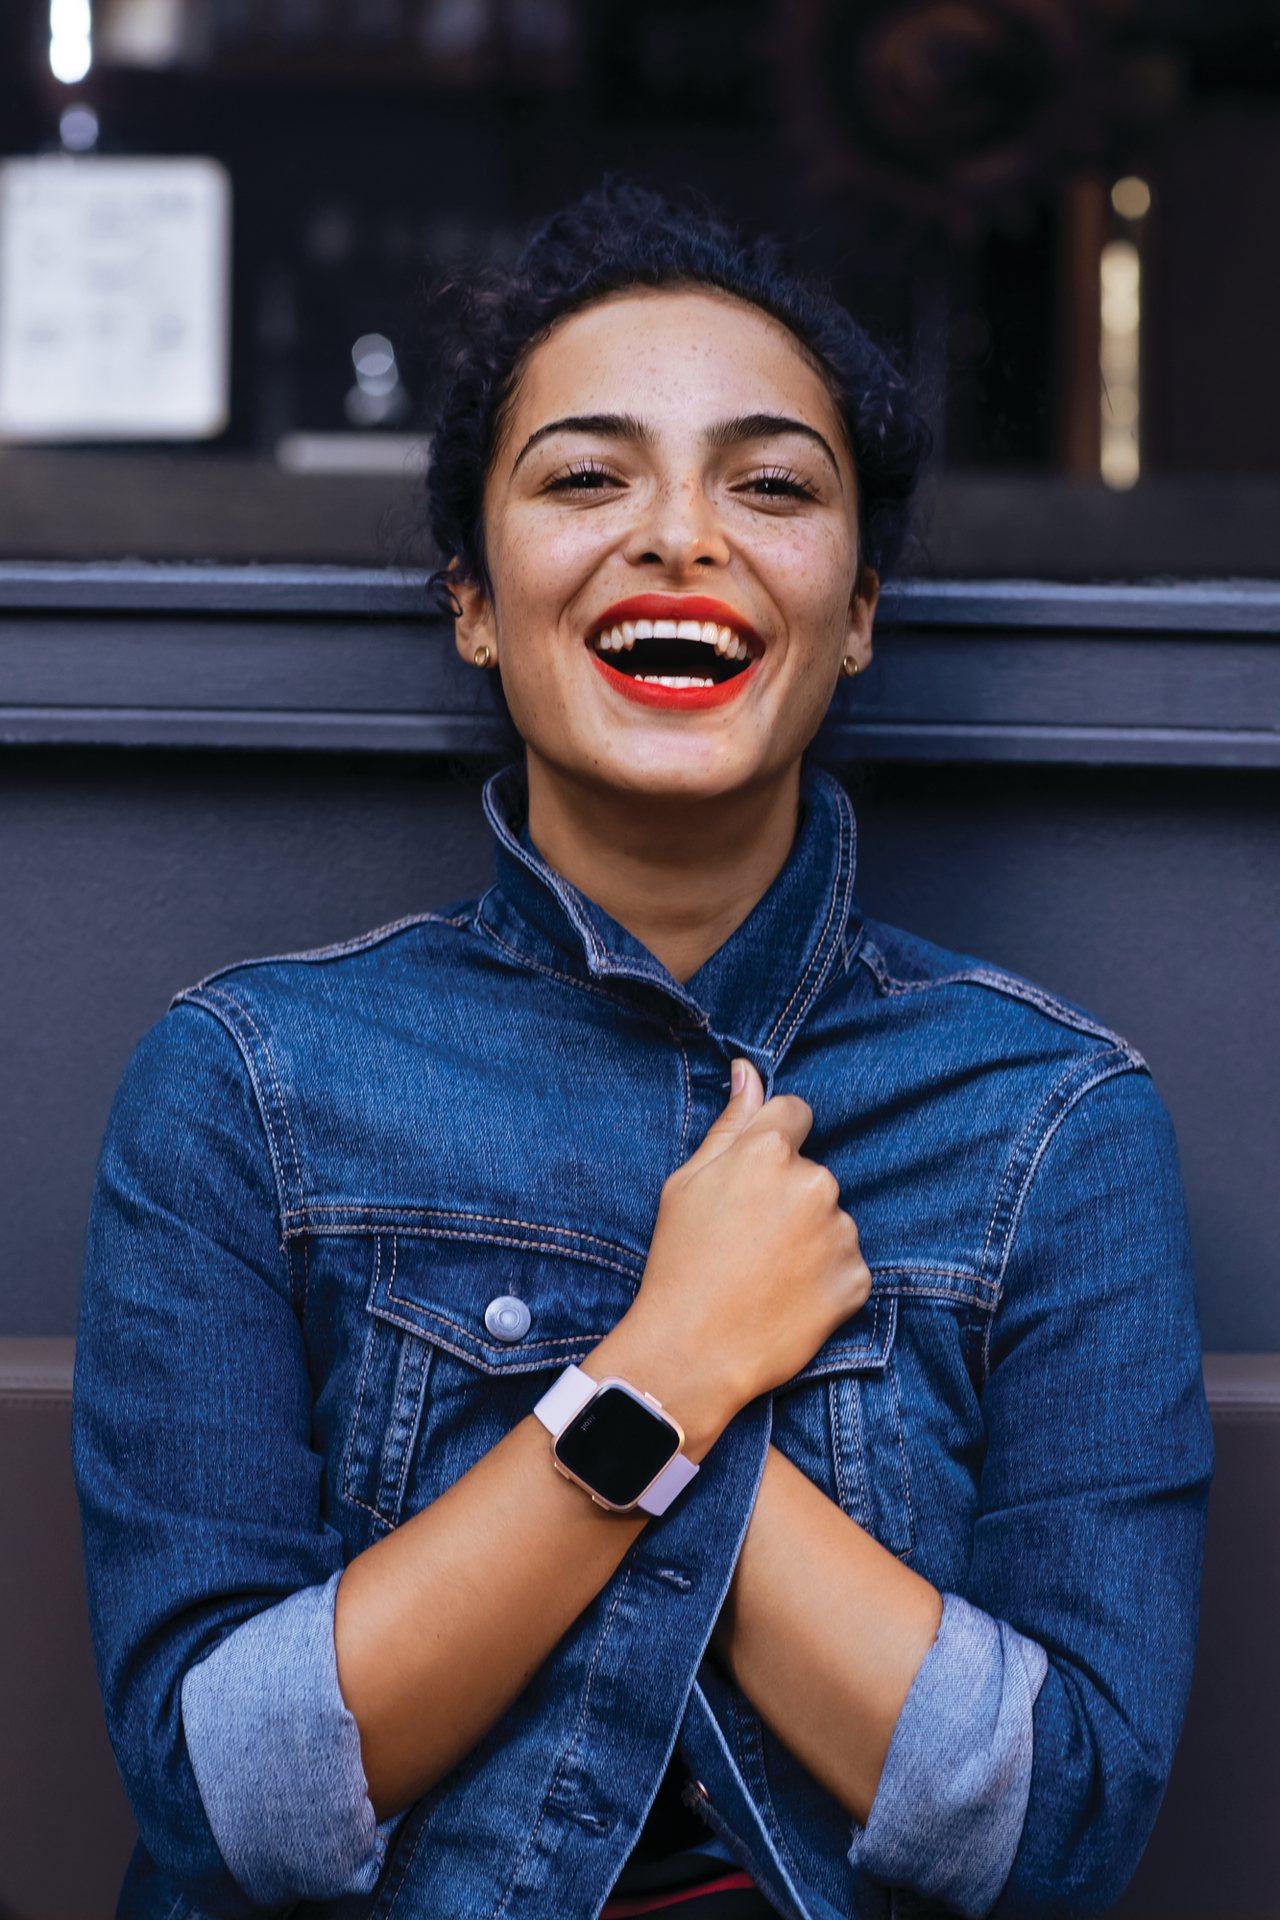 Fitbit最新推出的智慧手表Fitbit Versa全球上市以來已出貨超過10...